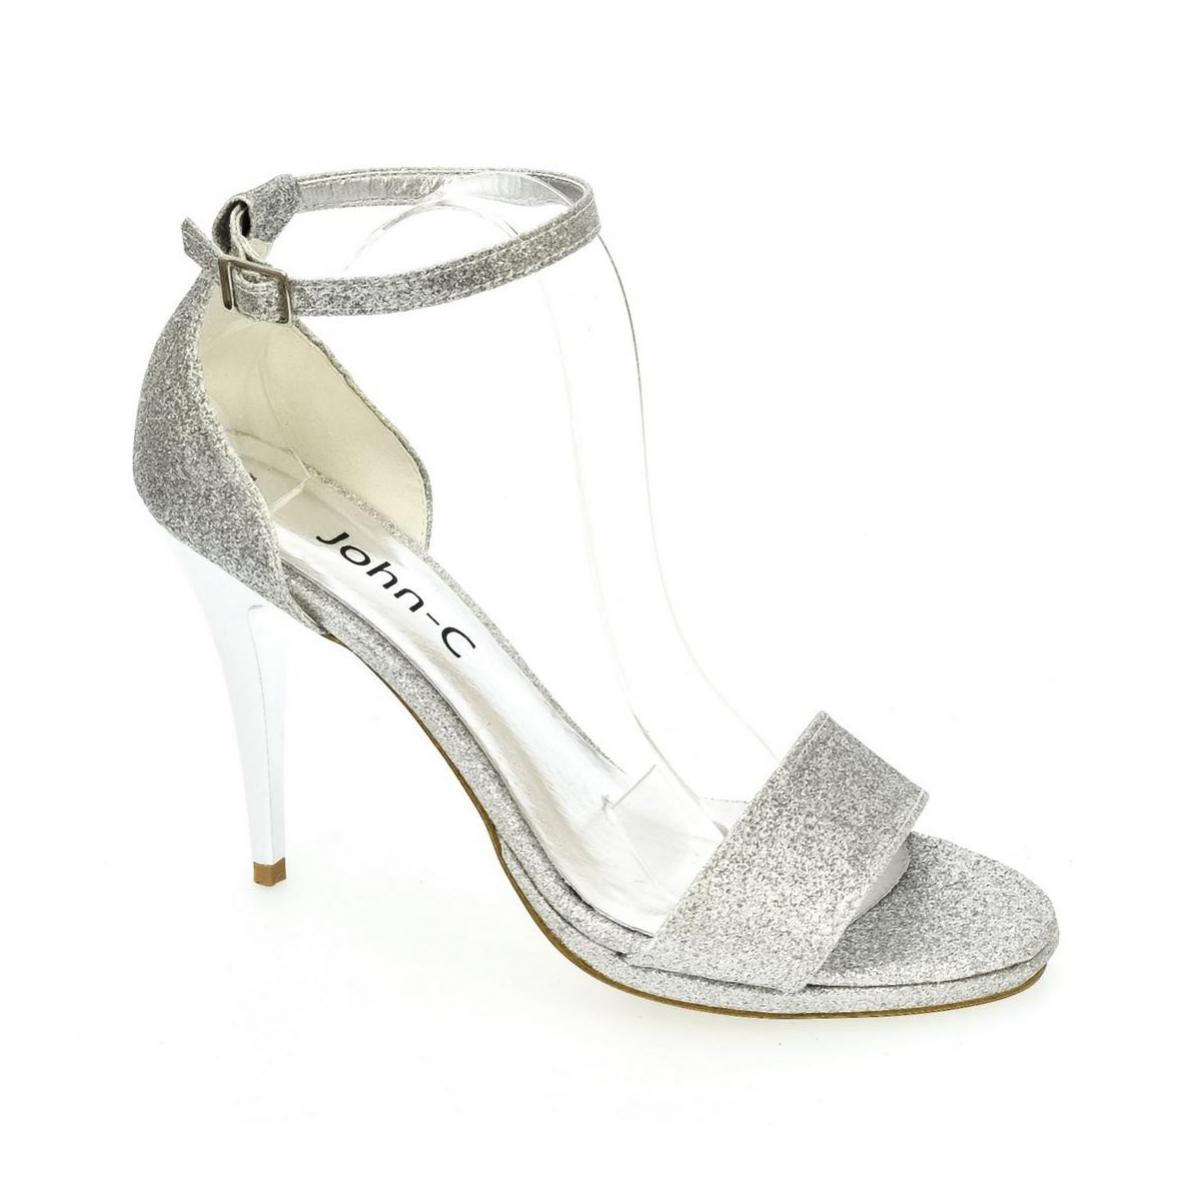 8929c6973d320 Dámske strieborné sandále KAJA - 5